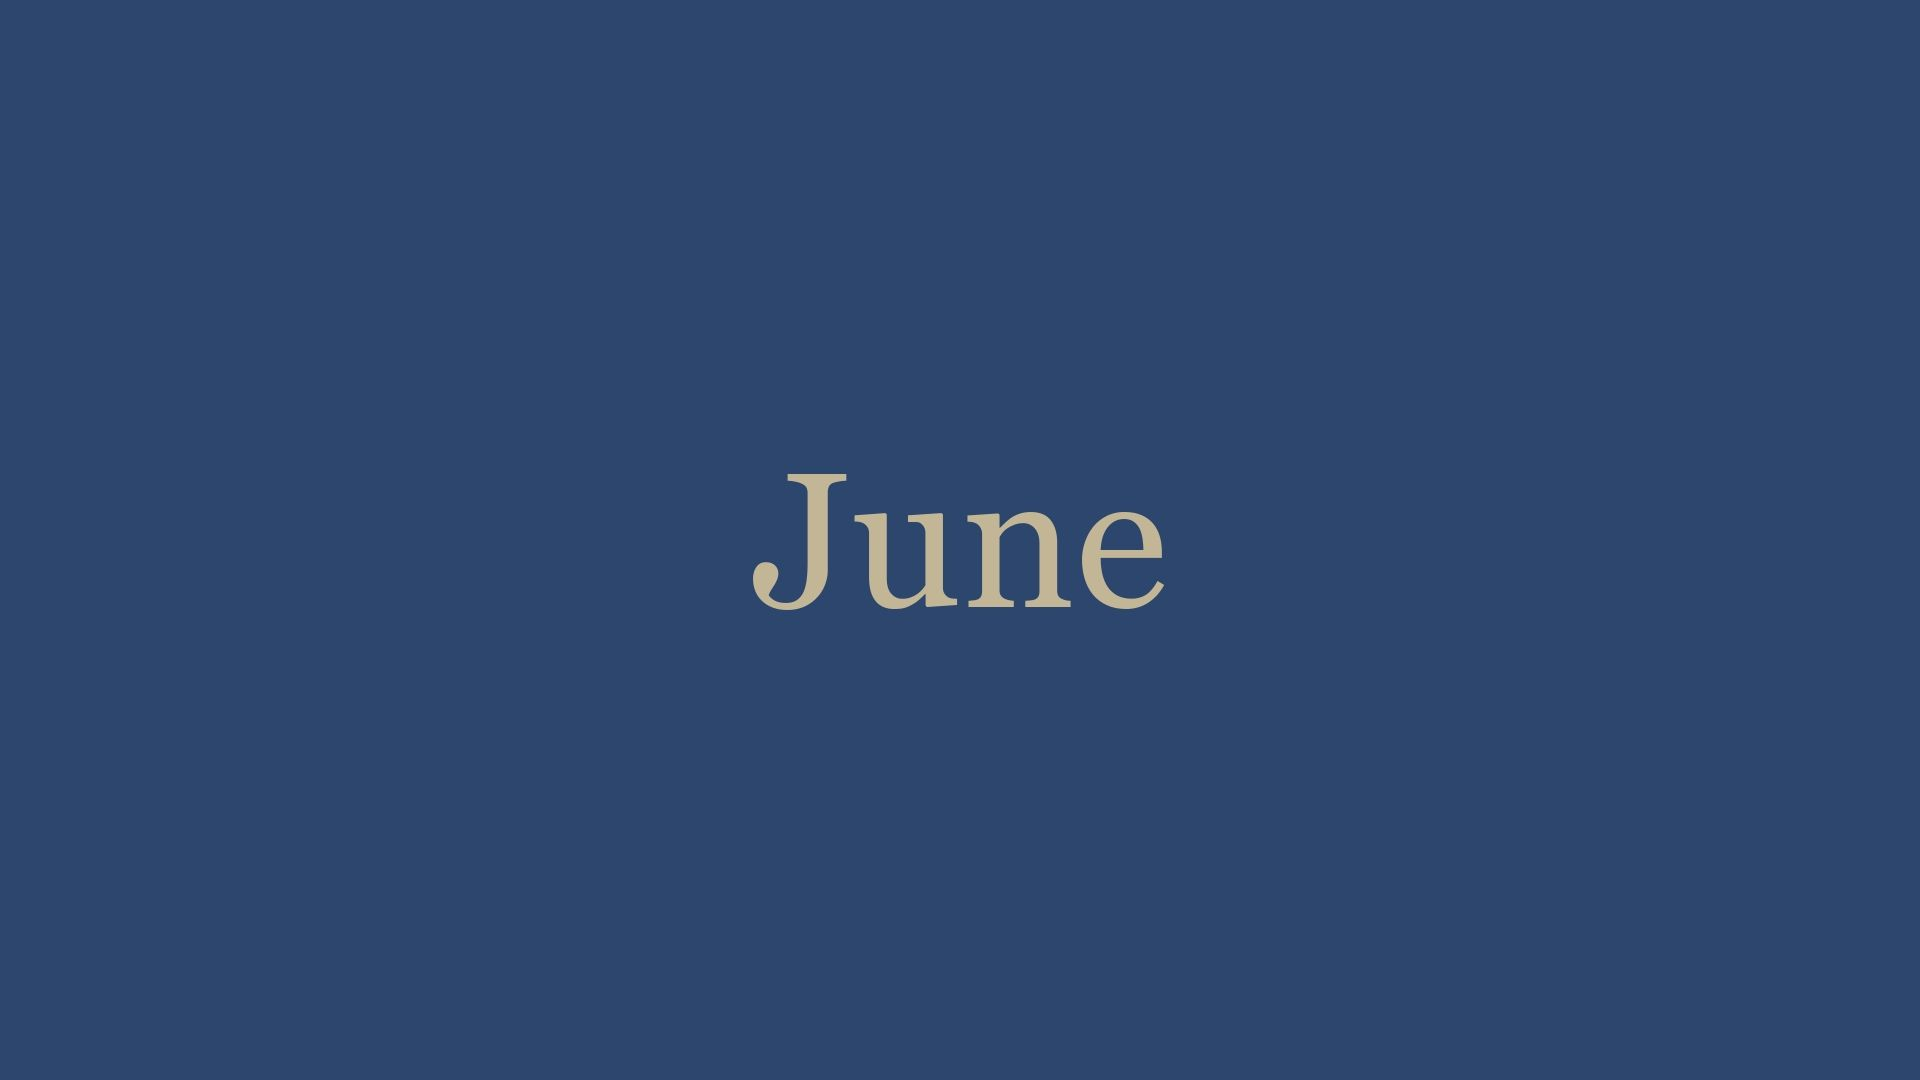 June '21